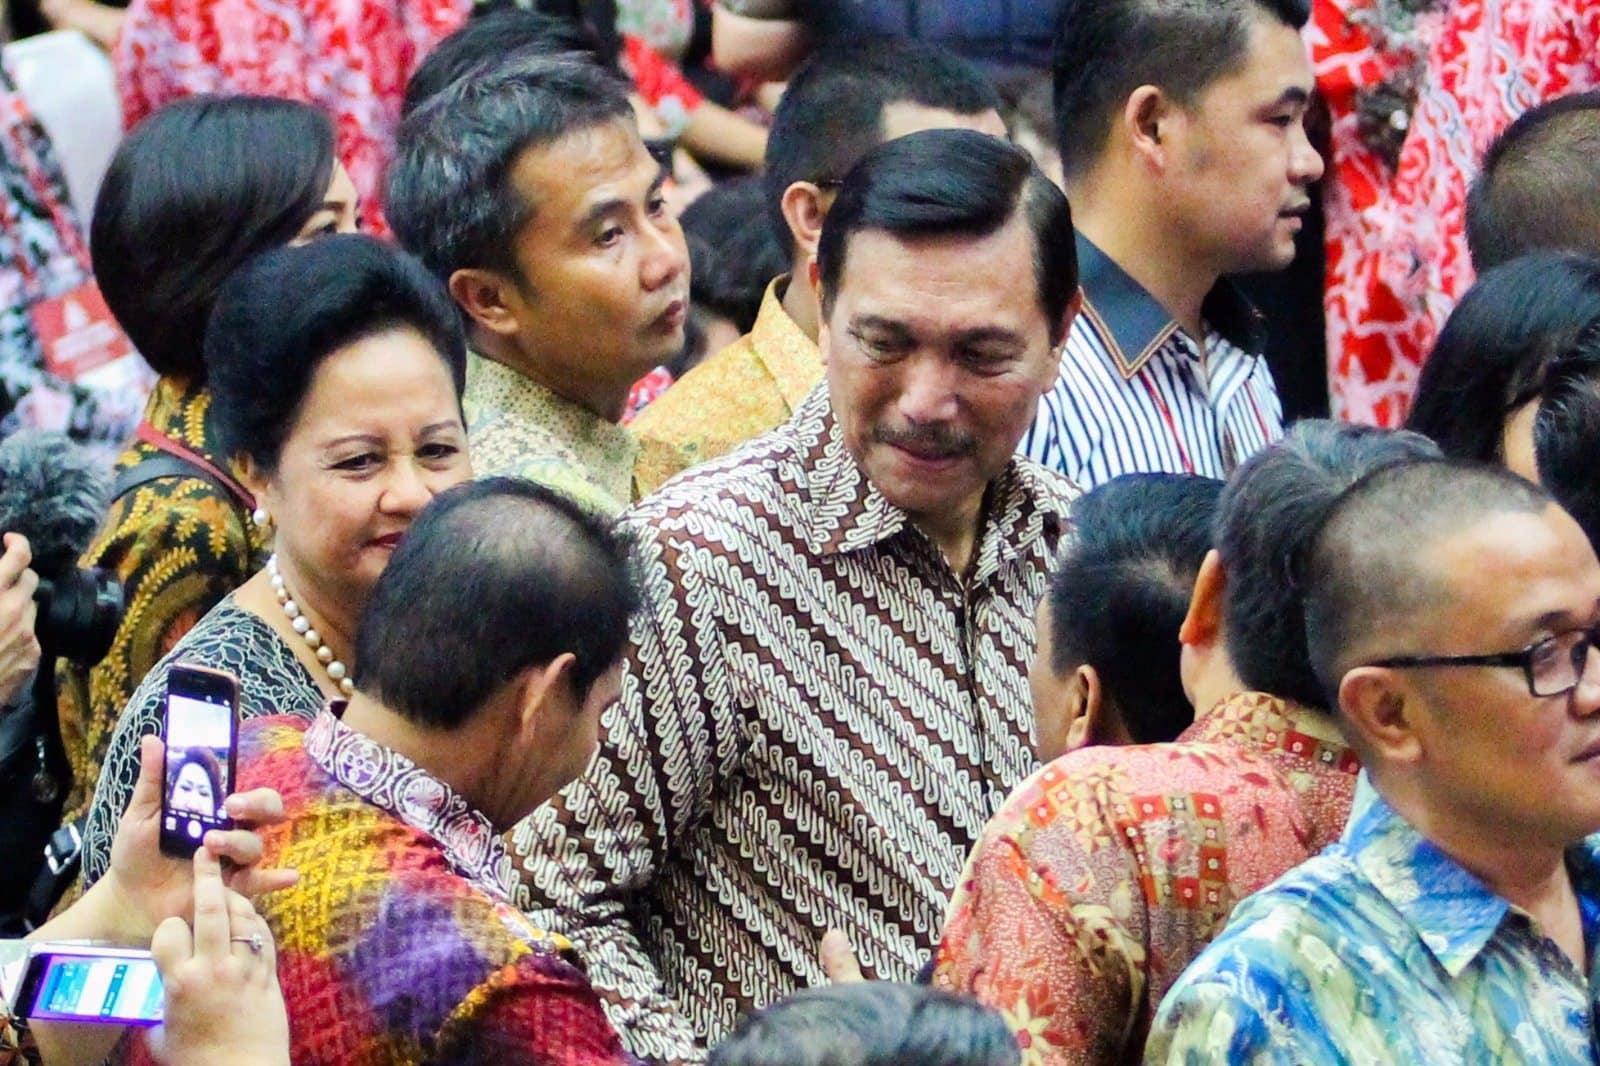 Menko Luhut B. Pandjaitan menghadiri Natal Nasional 2016 di Gedung Wale Ne Tou, Tondano, Sulawesi Utara.